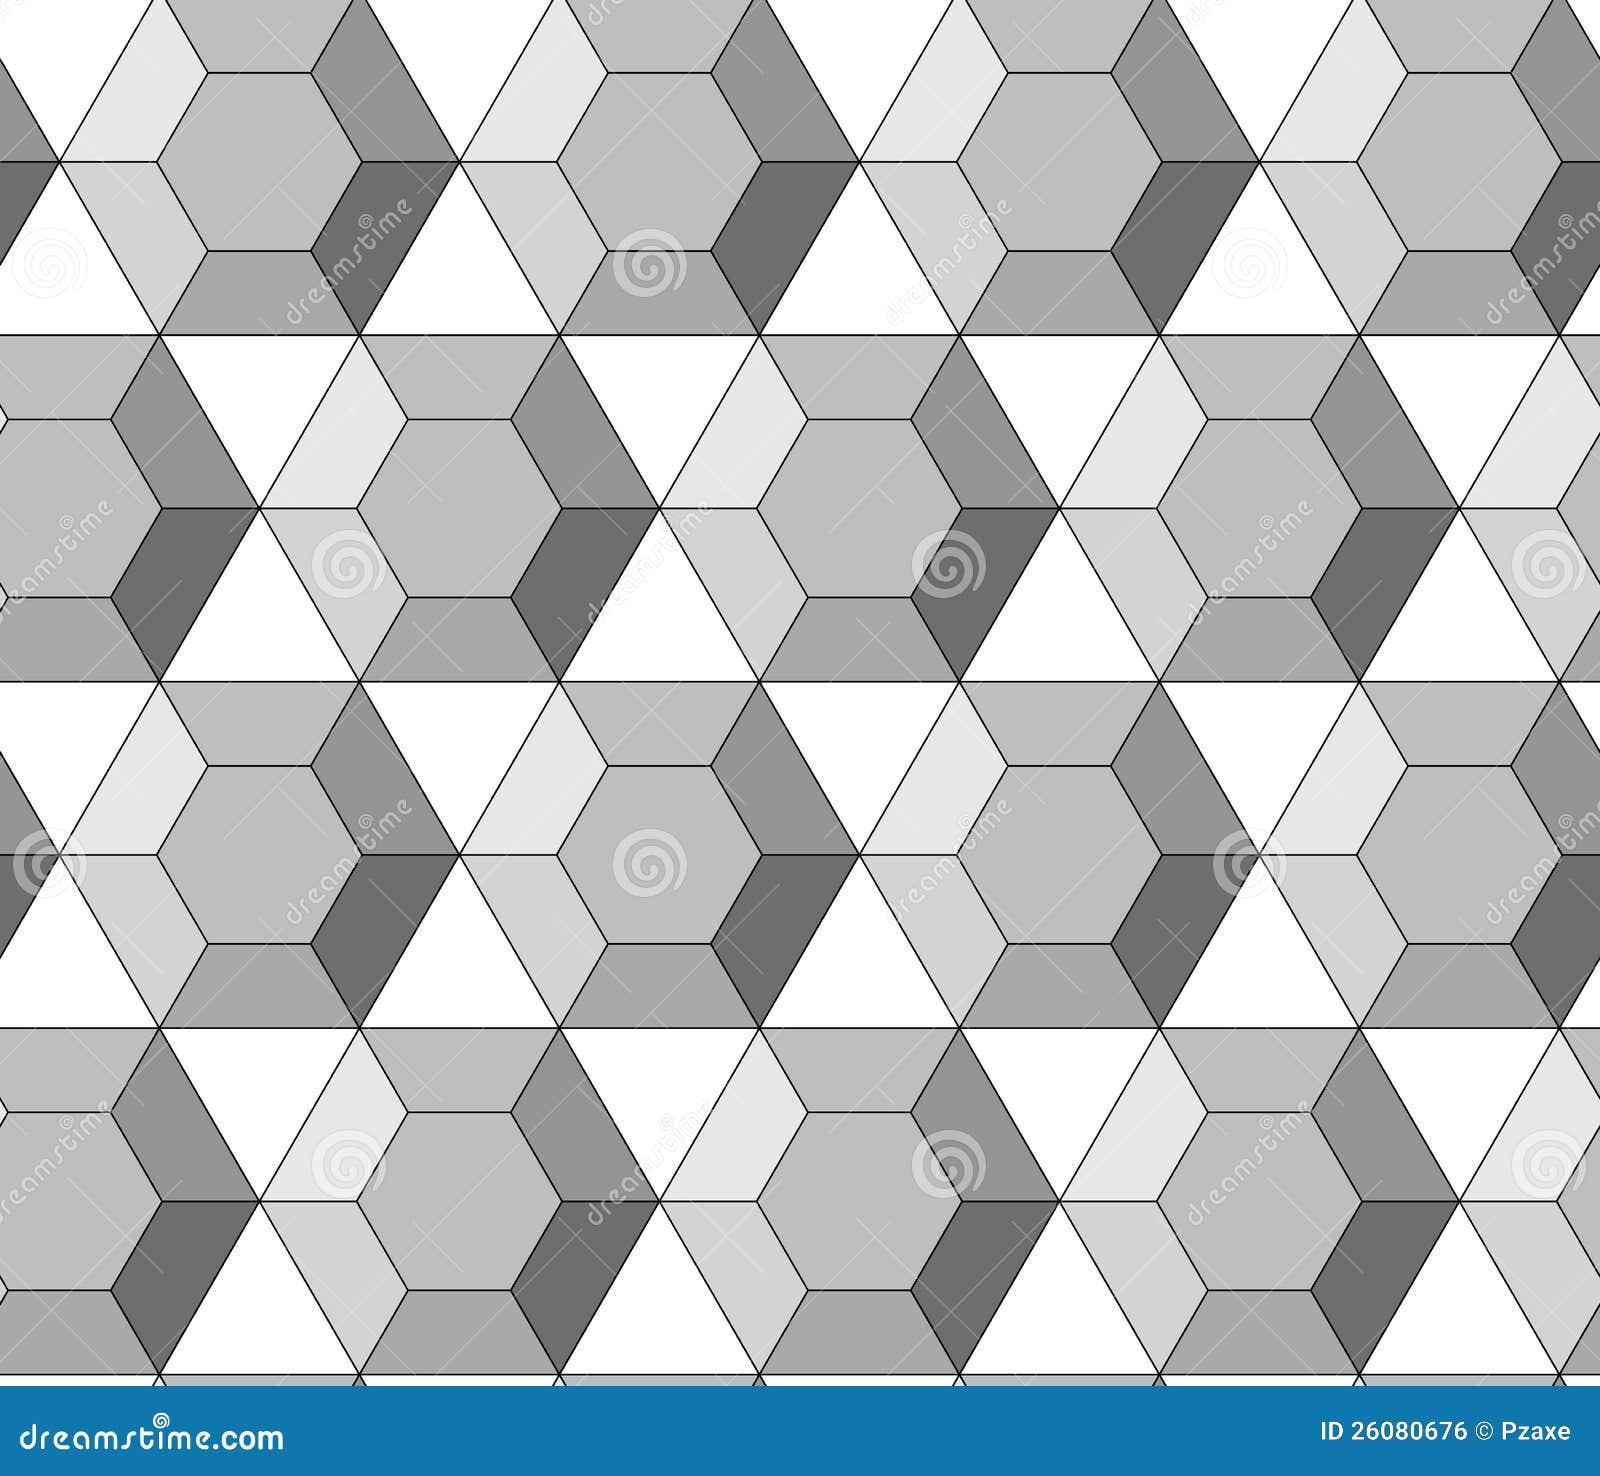 Royalty Free Stock Image  Simple vector pattern - hexagonal diamondsHexagonal Pattern Vector